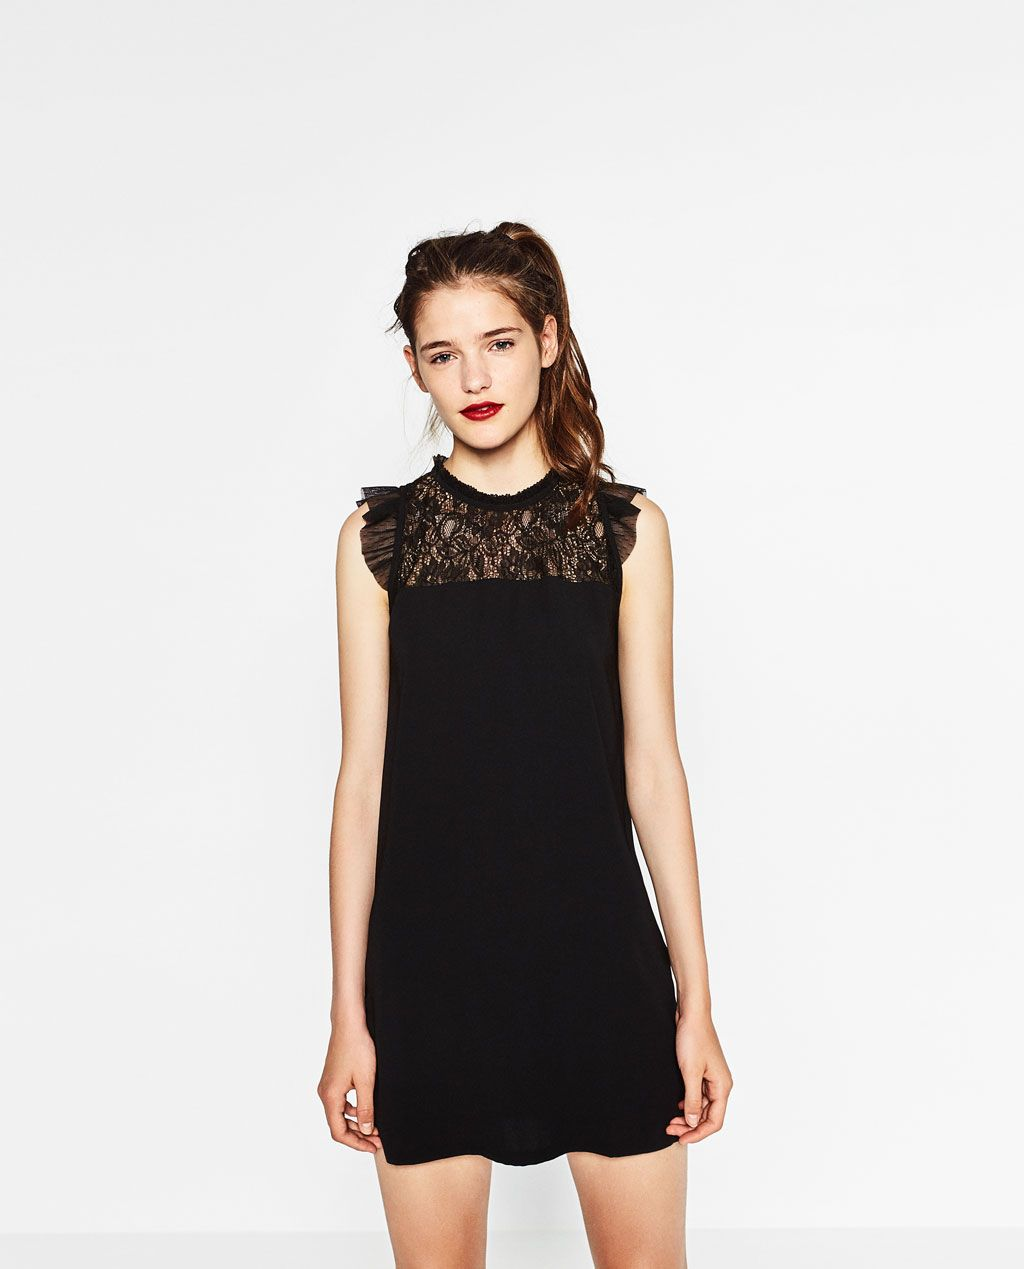 80629d2534 DRESS WITH A LACE BIB FRONT-DRESSES-WOMAN